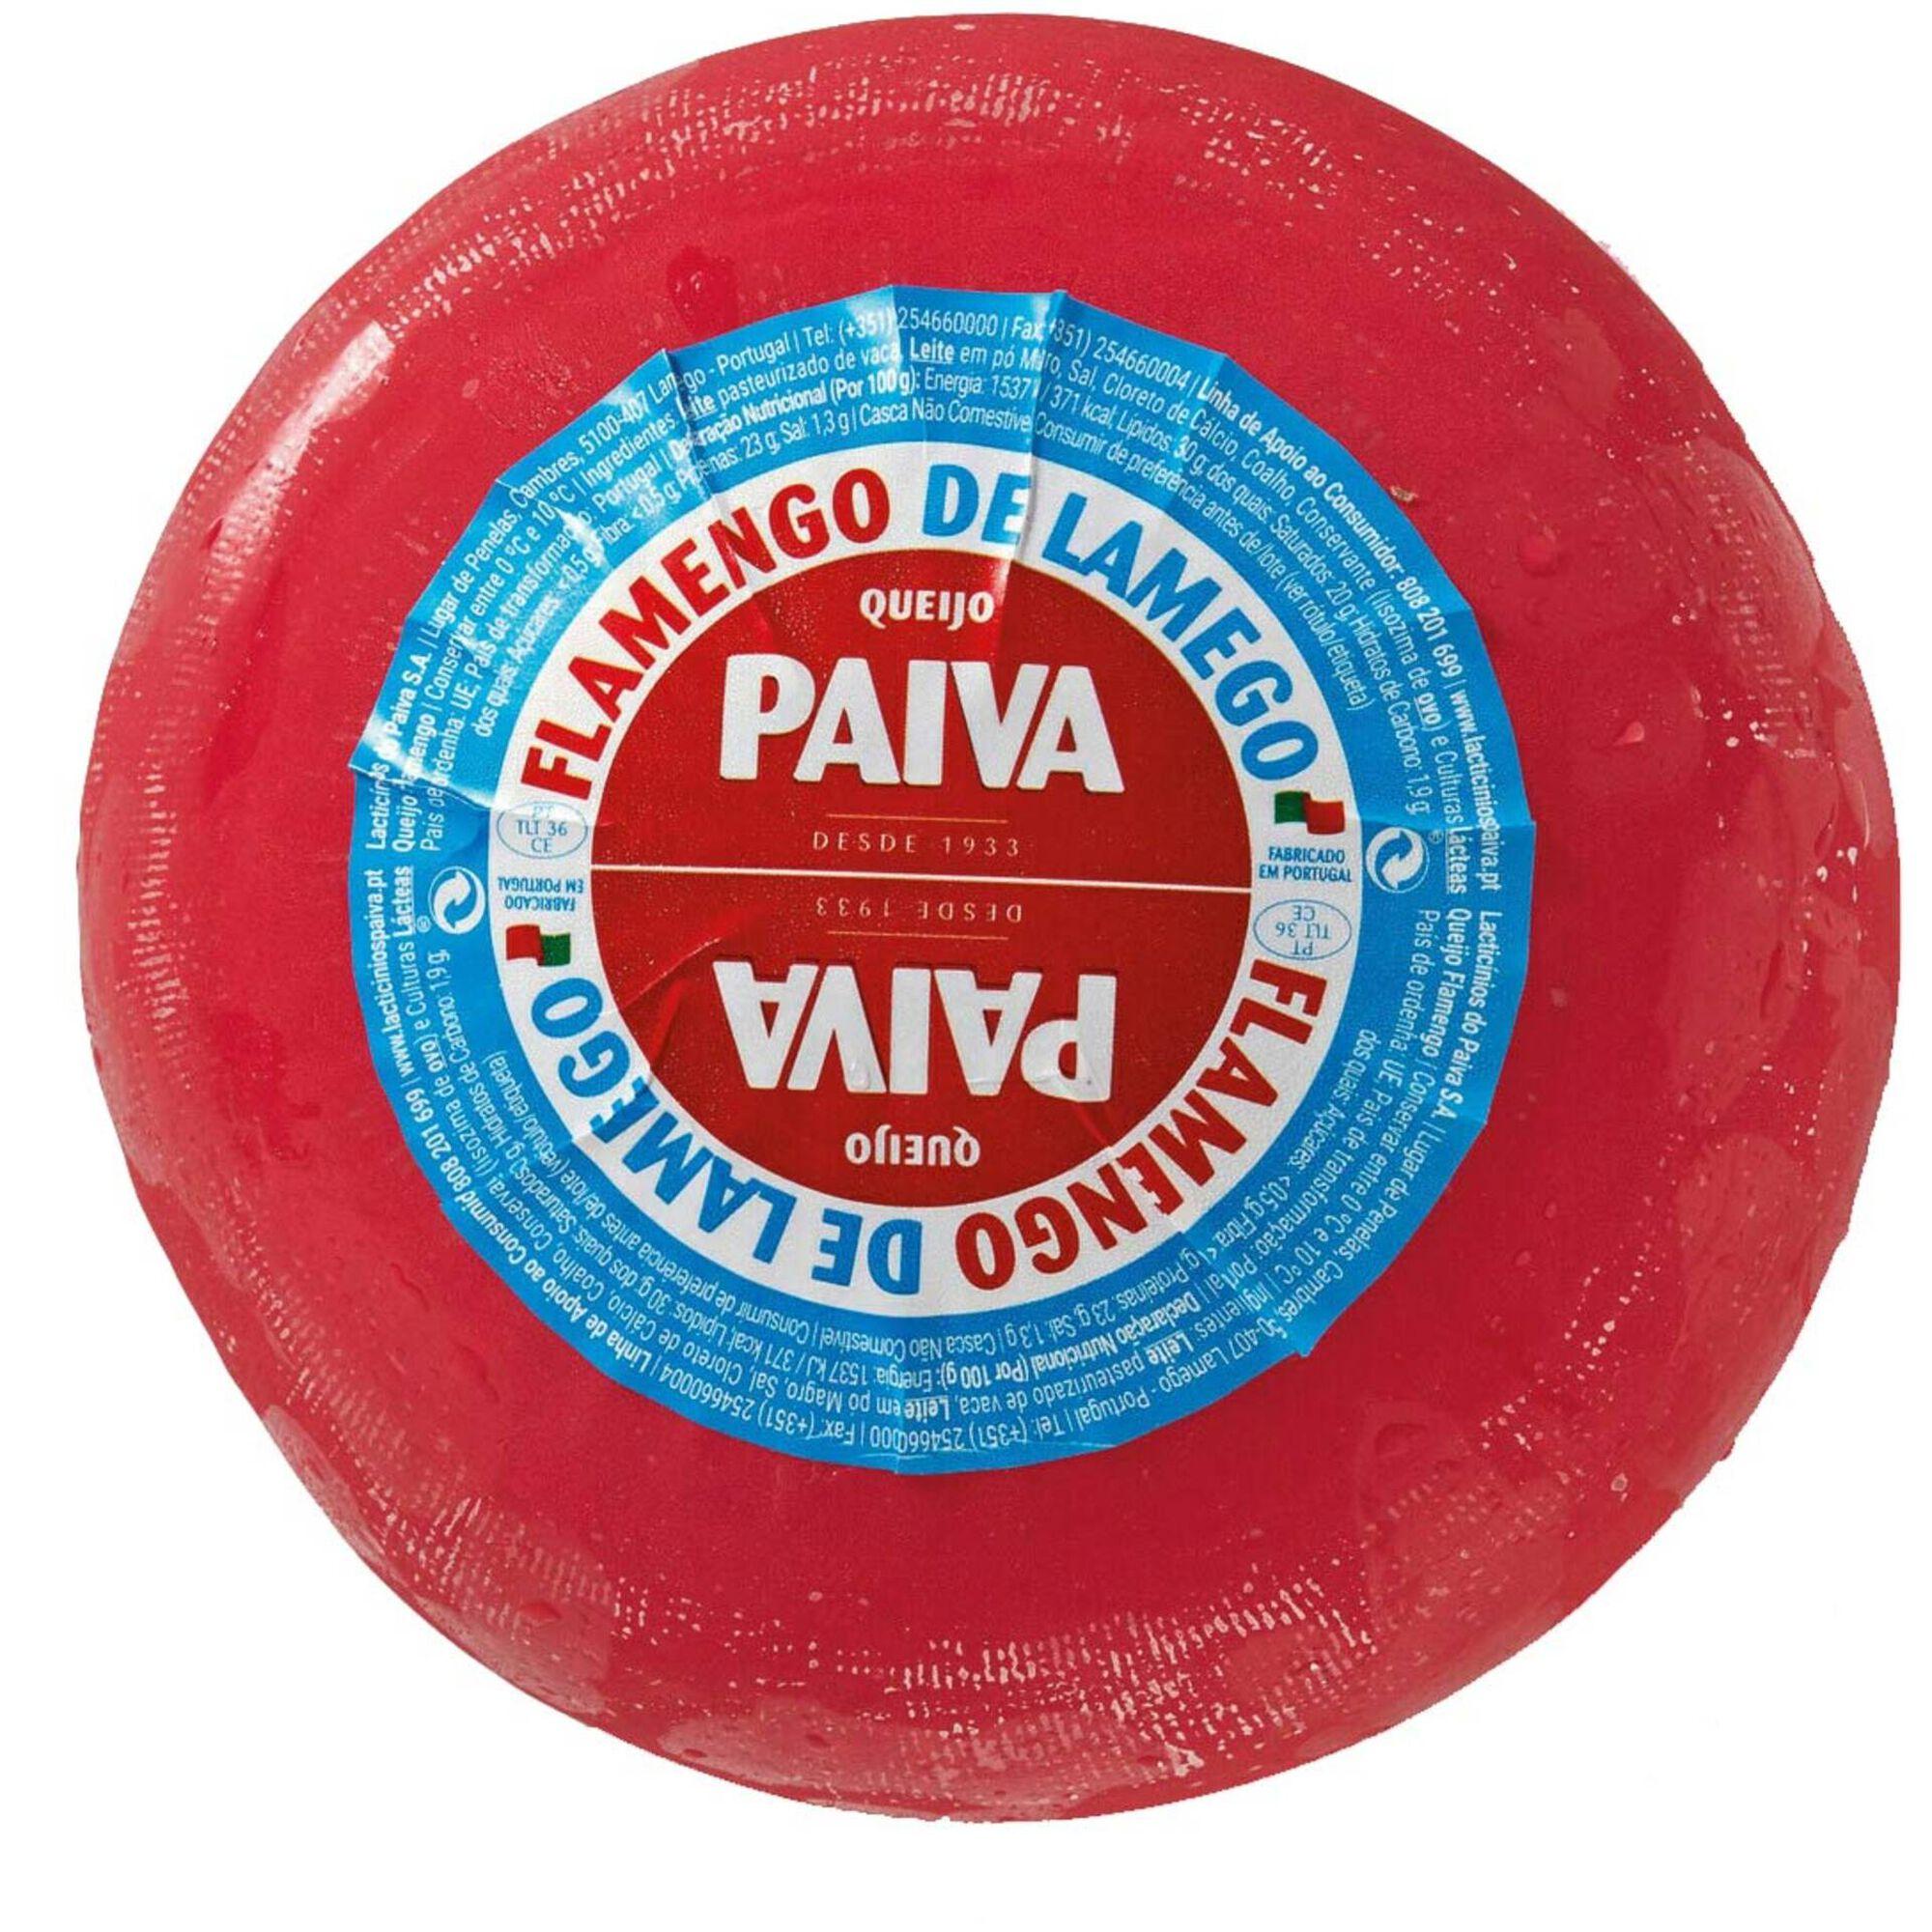 Queijo Flamengo Bola Inteiro